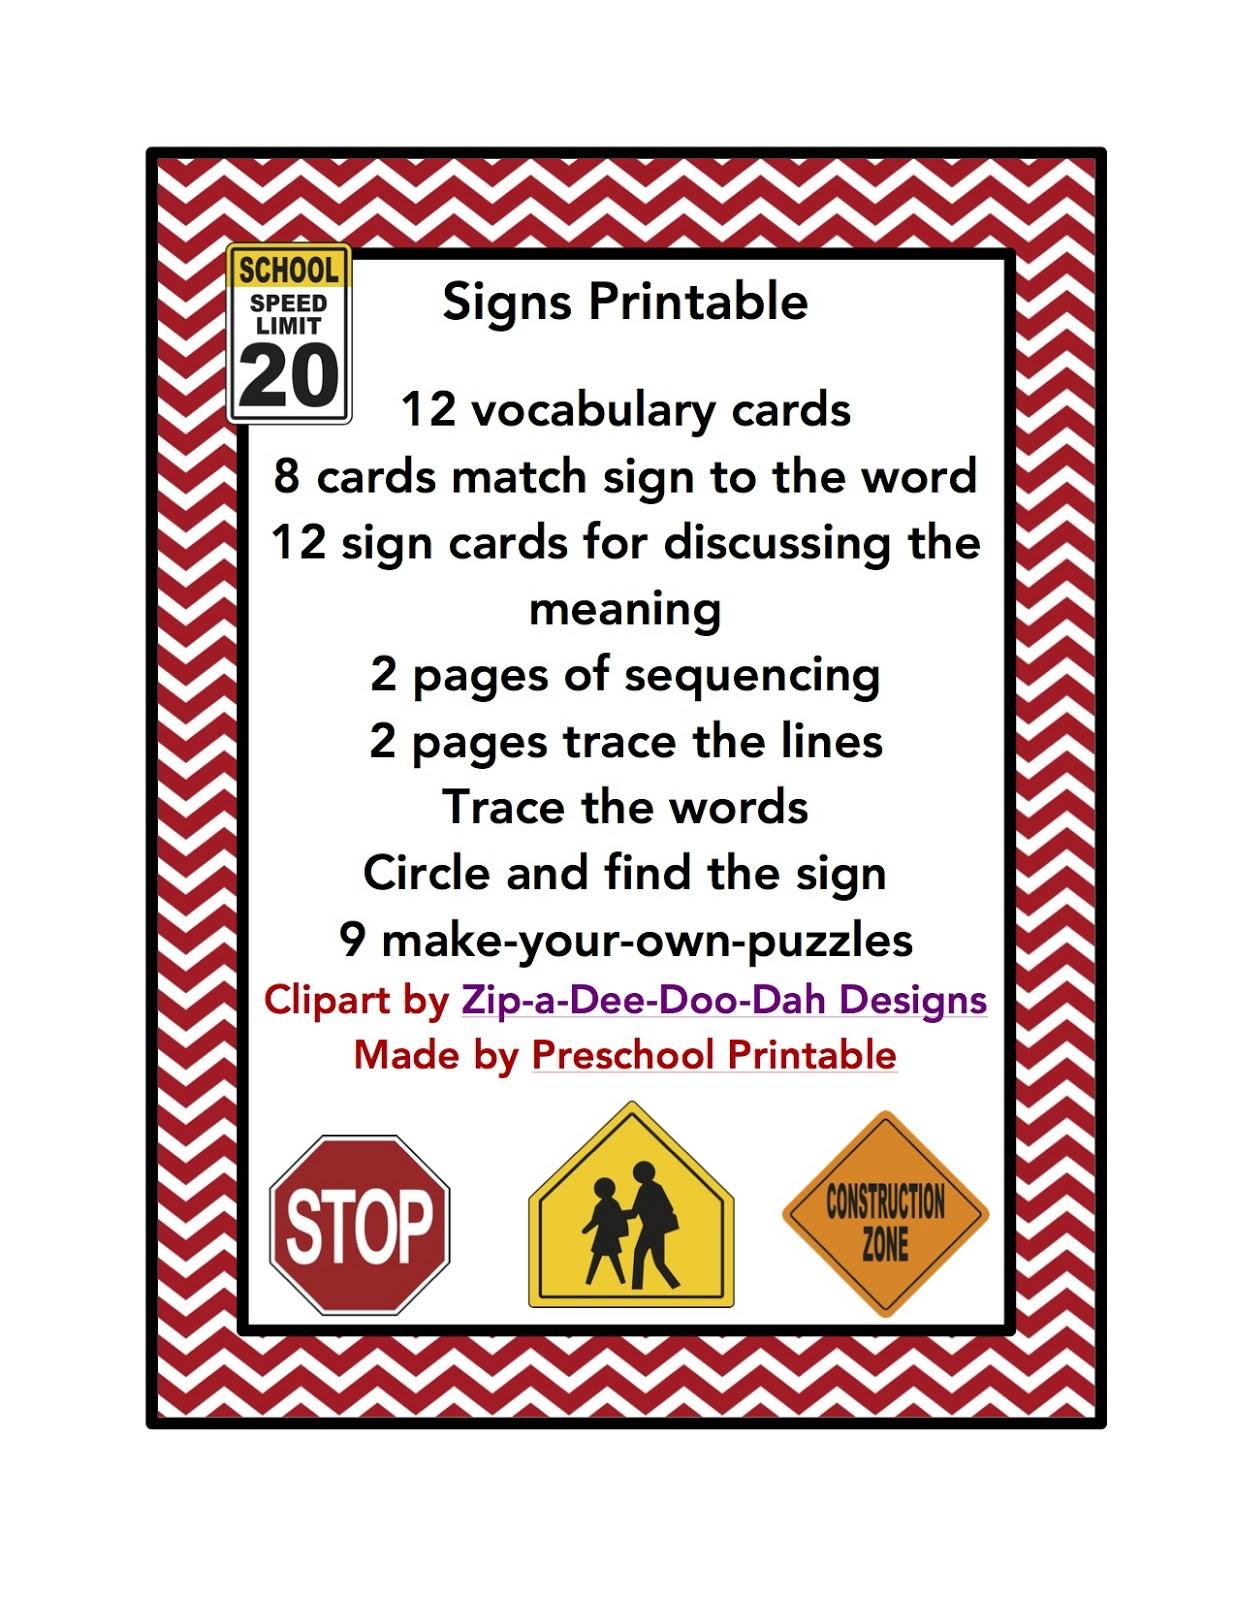 Preschool Printables Sign Printable